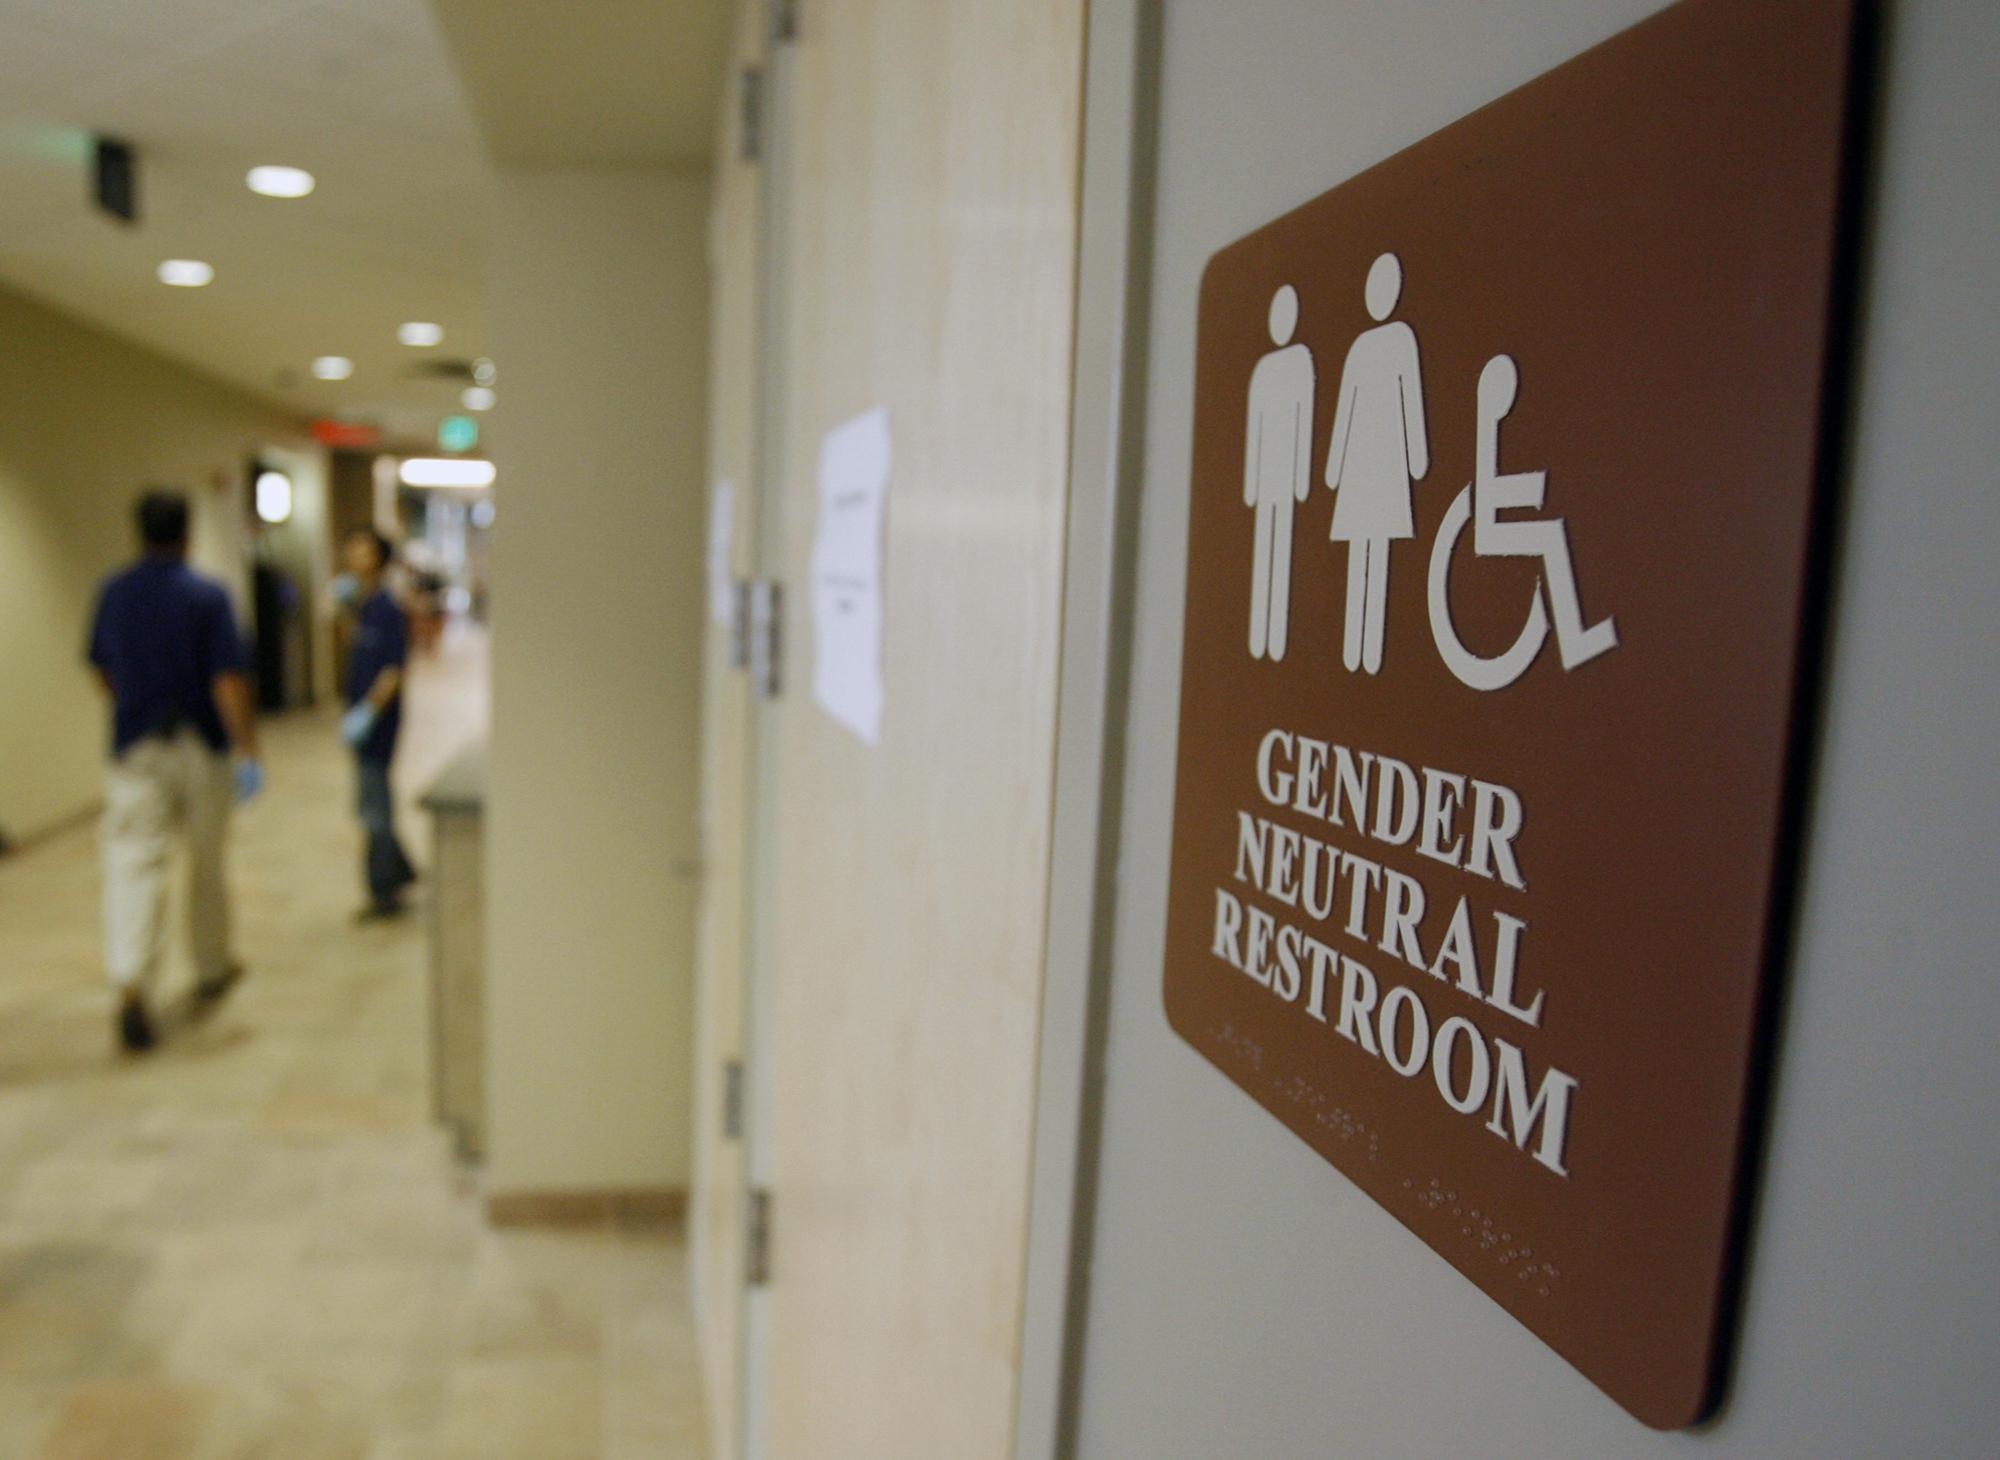 california approves genderneutral bathrooms  cbs news, Bathroom decor